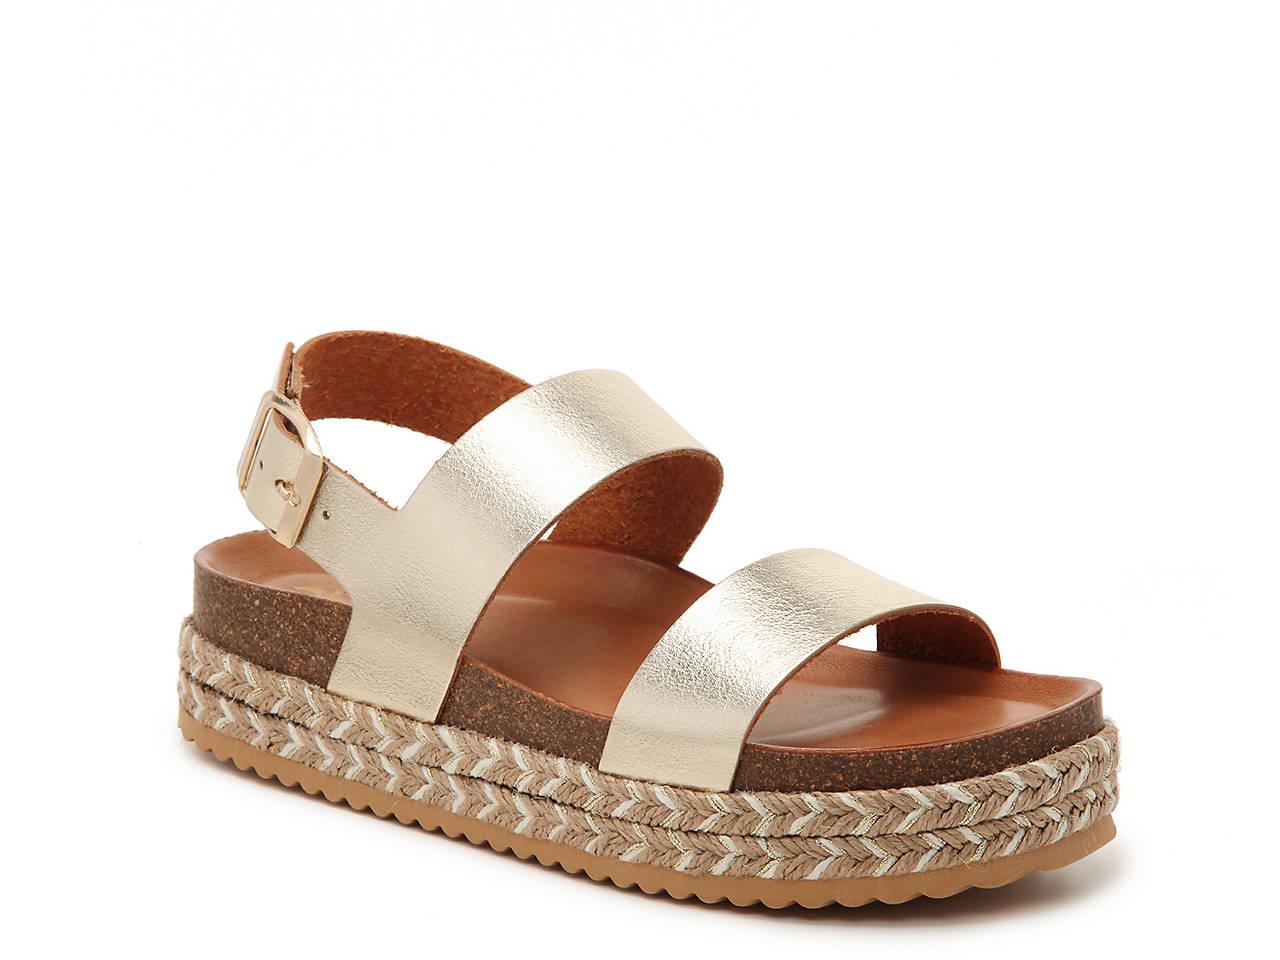 6d4e15e7198 Ruryan Espadrille Platform Sandal